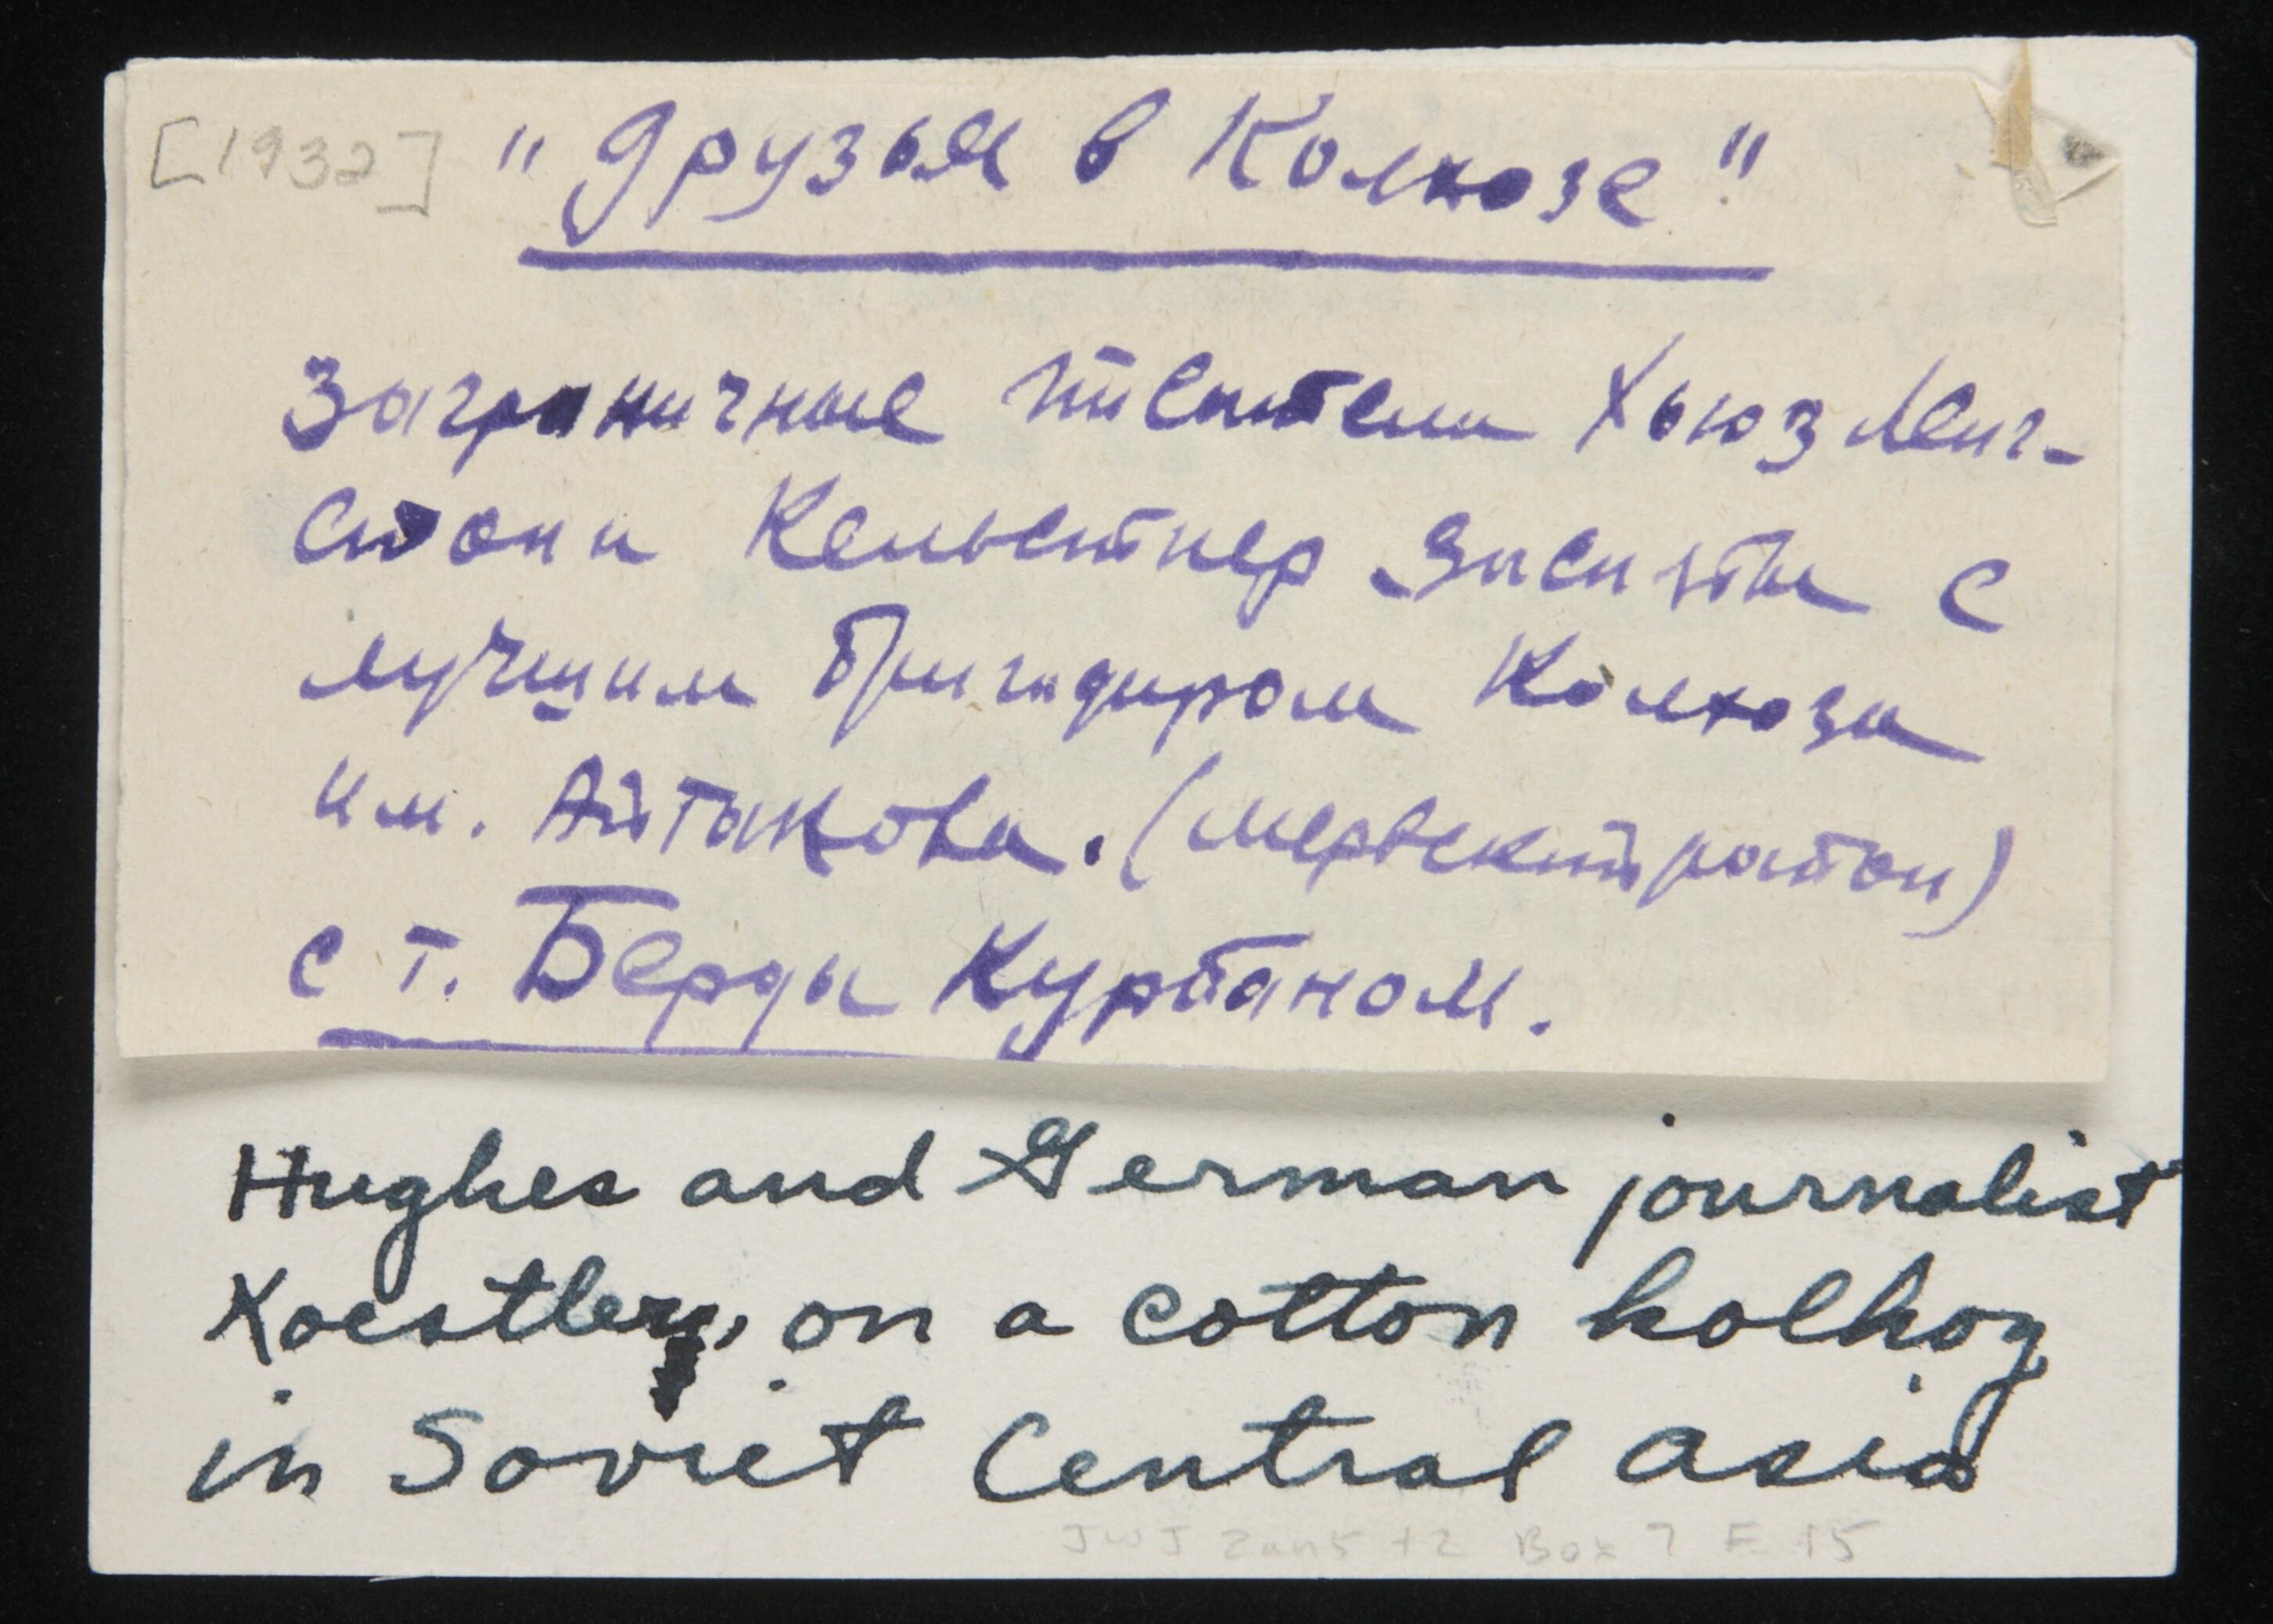 Langston Hughes and German journalist Arthur Koestler on a cotton kolhoy in Soviet Central Asia, 1932a